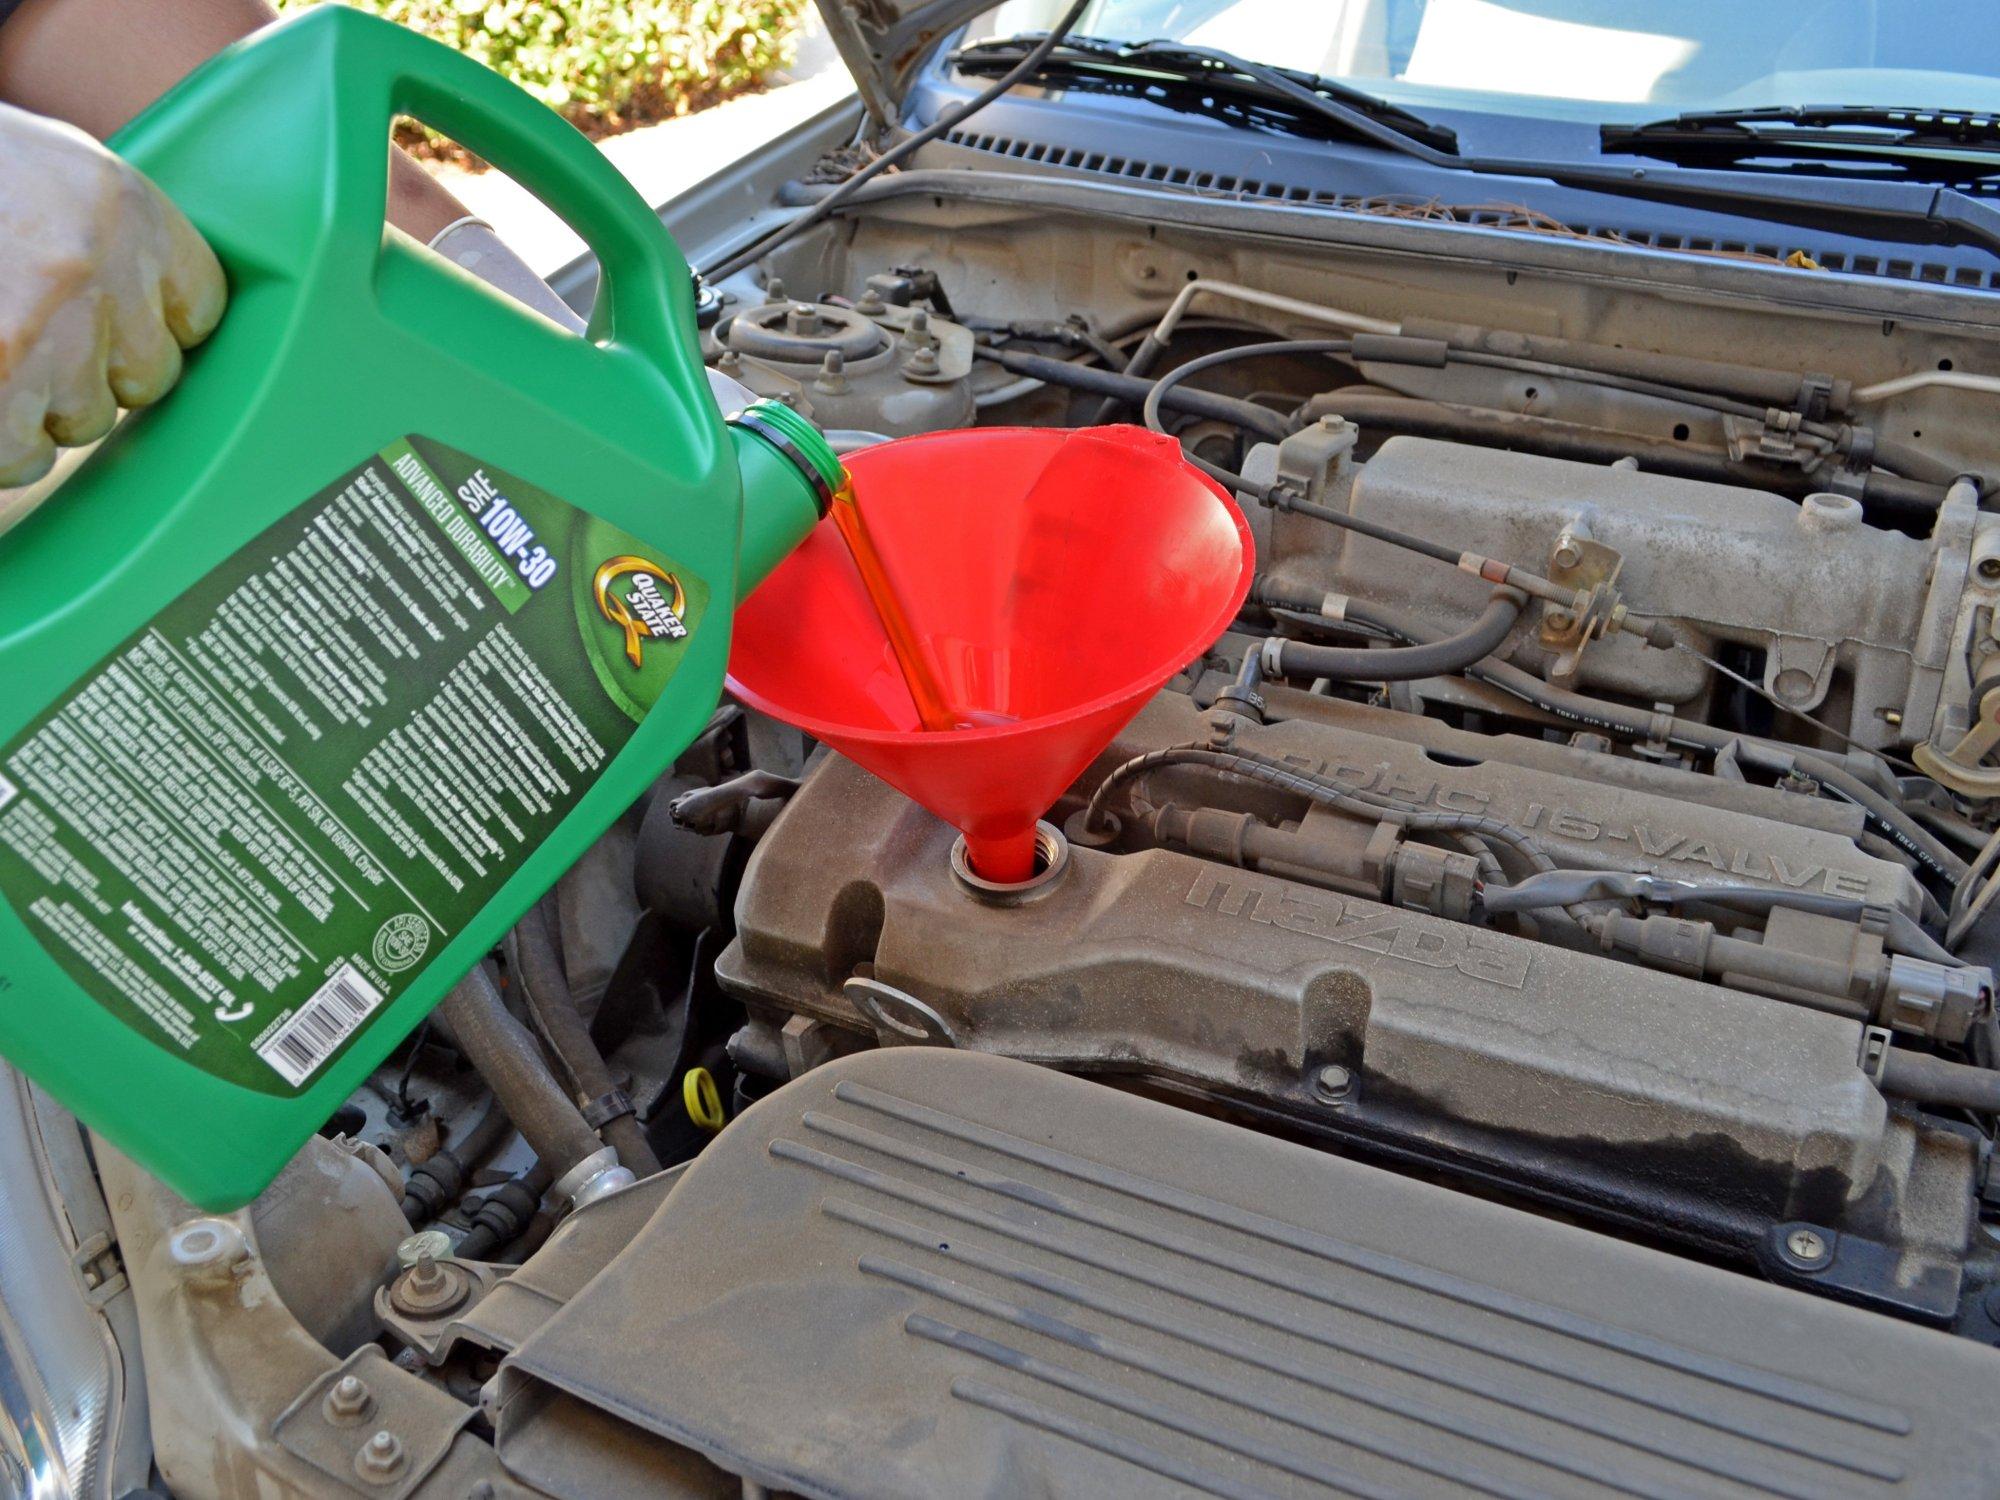 hight resolution of 1998 2003 mazda protege oil change 1 6 l dohc